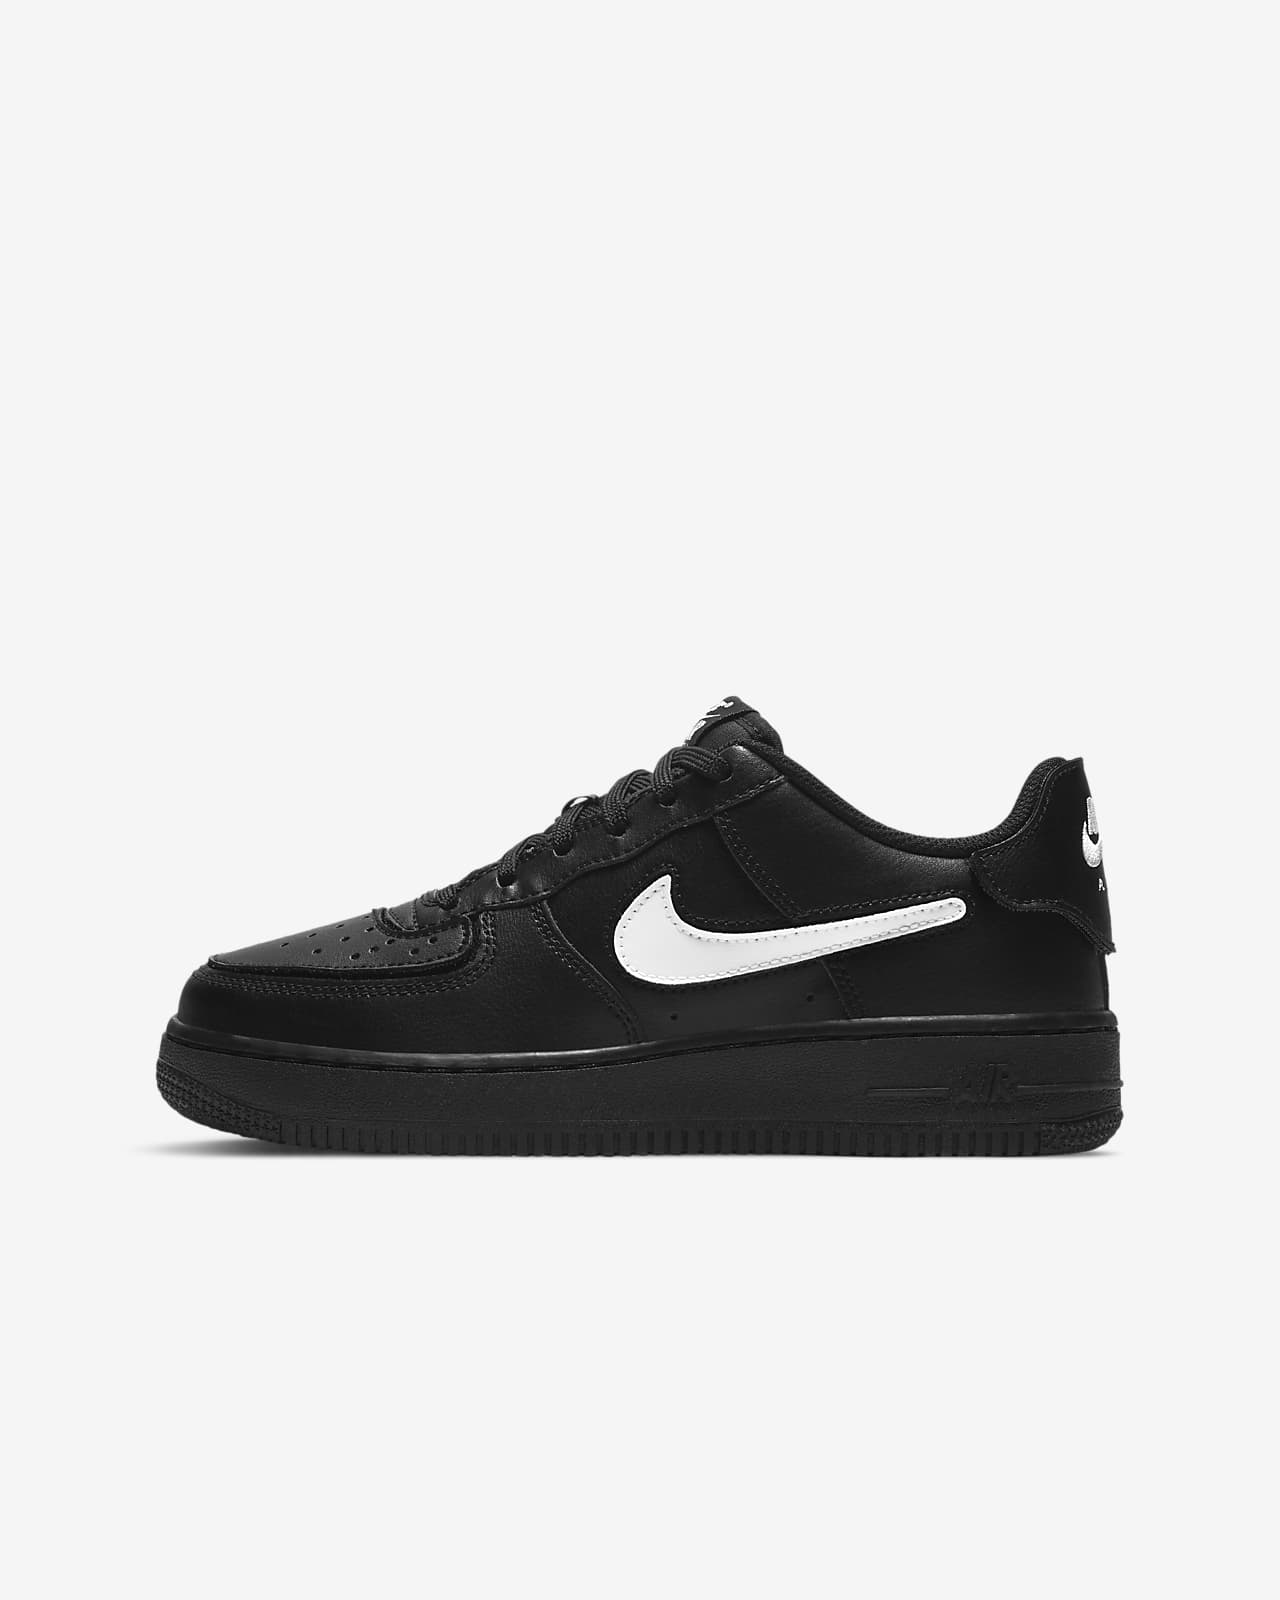 Calzado para niños talla grande Nike Air Force 1/1